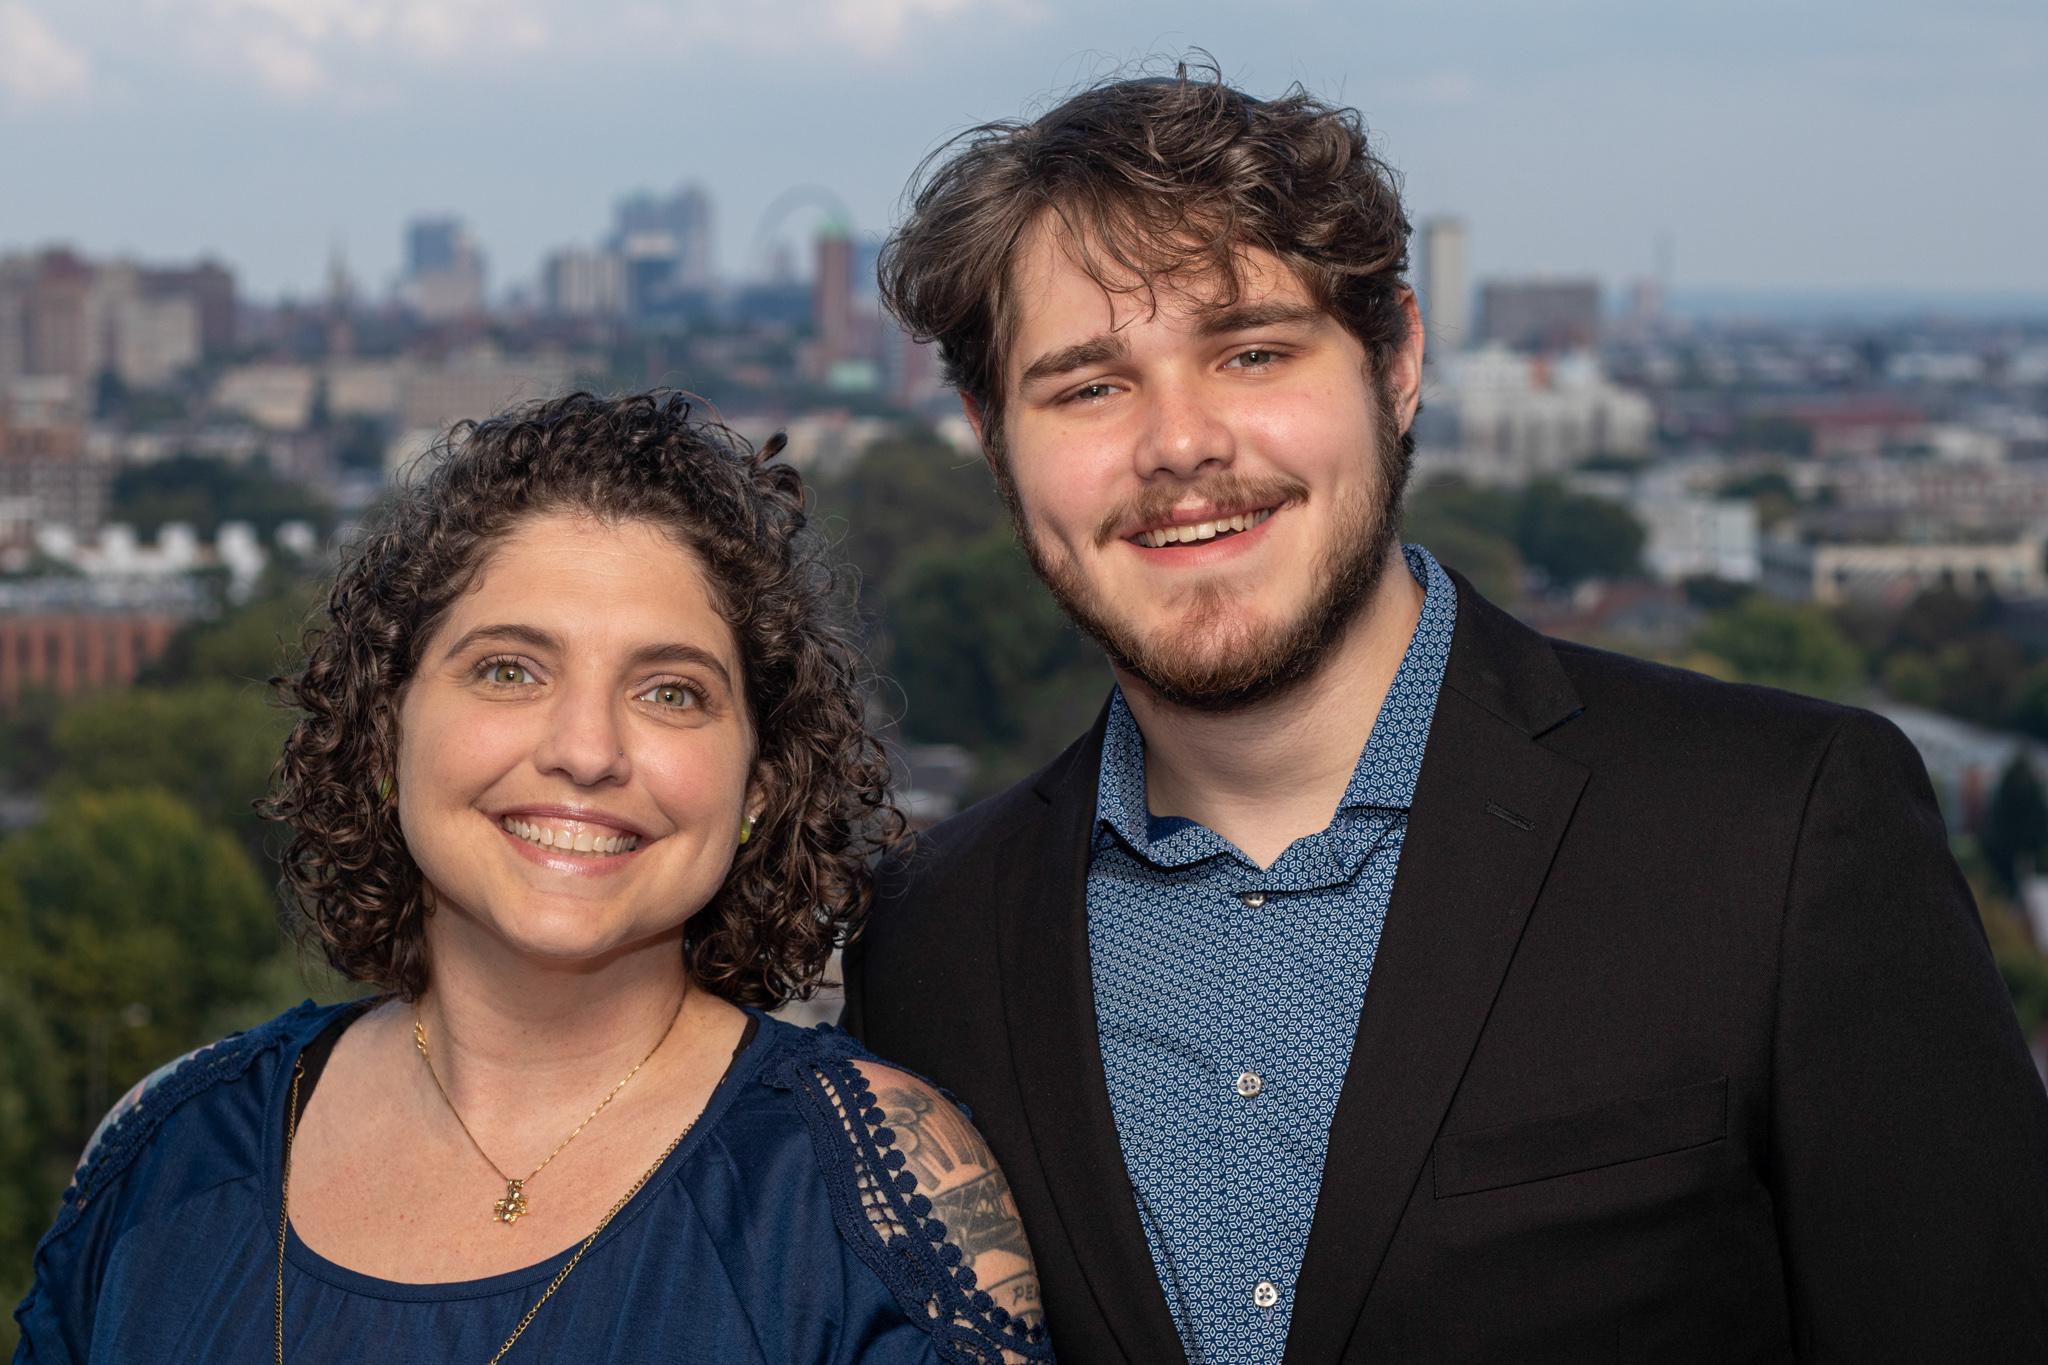 Tanner Smith and Randi Smith